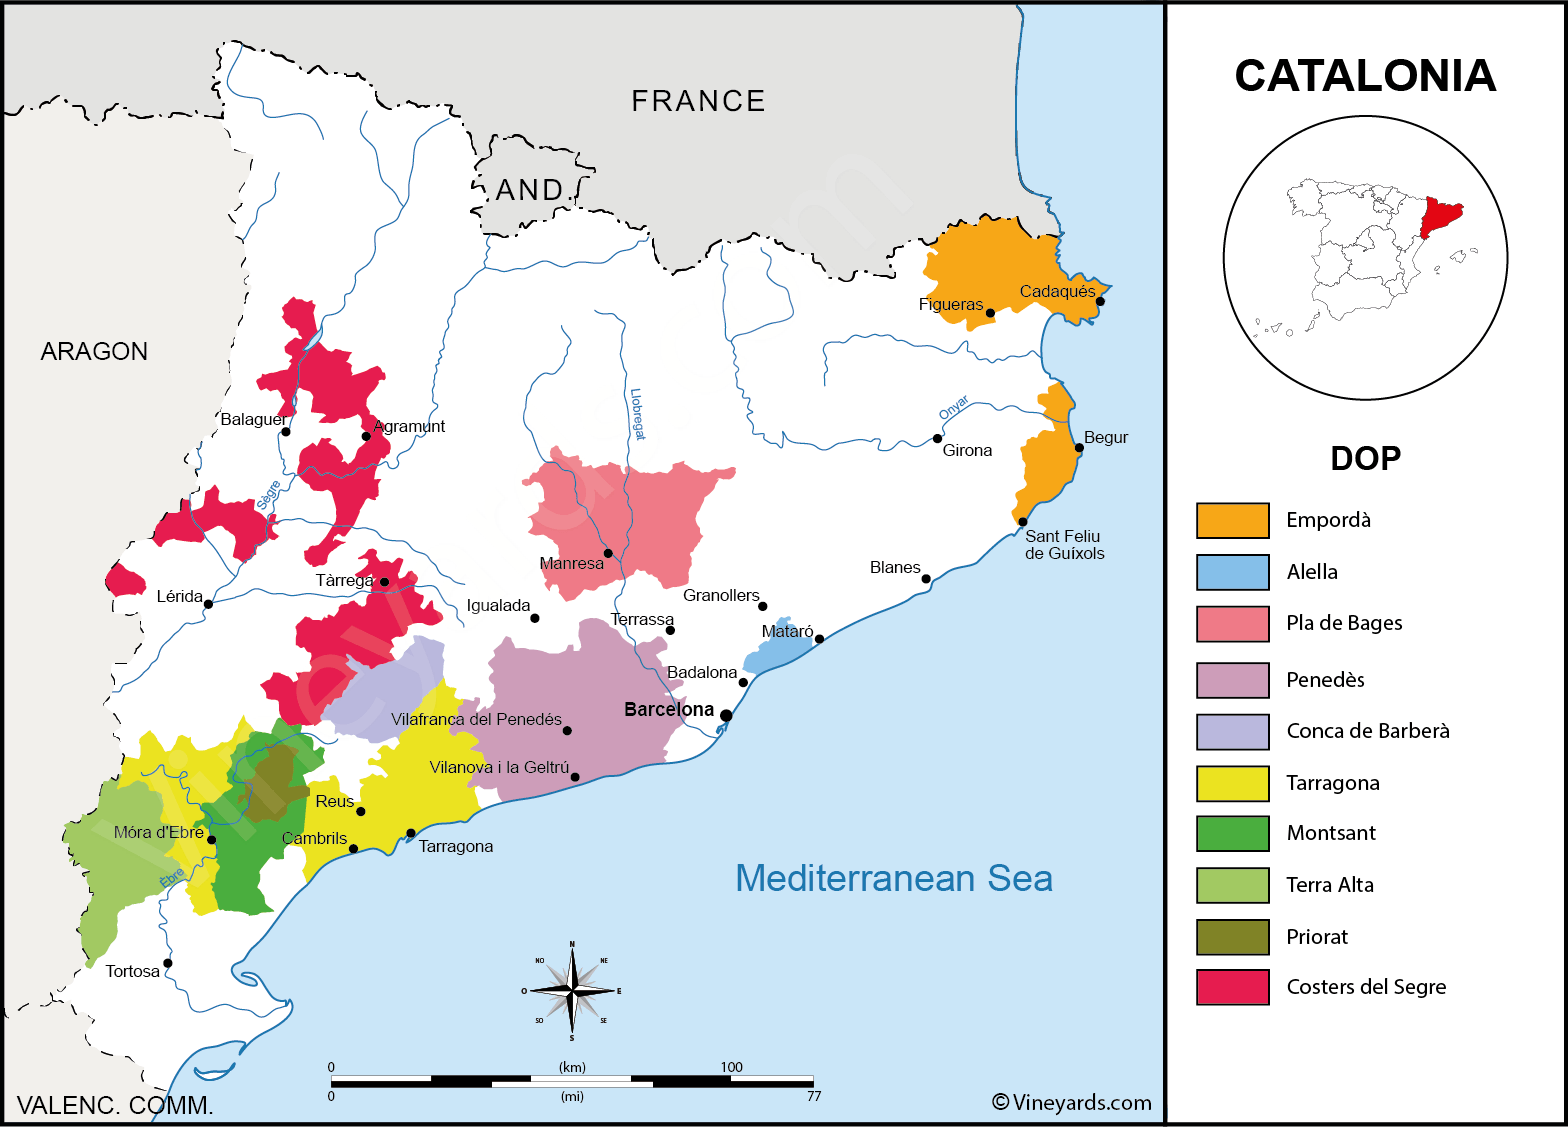 catalonia-wine-map